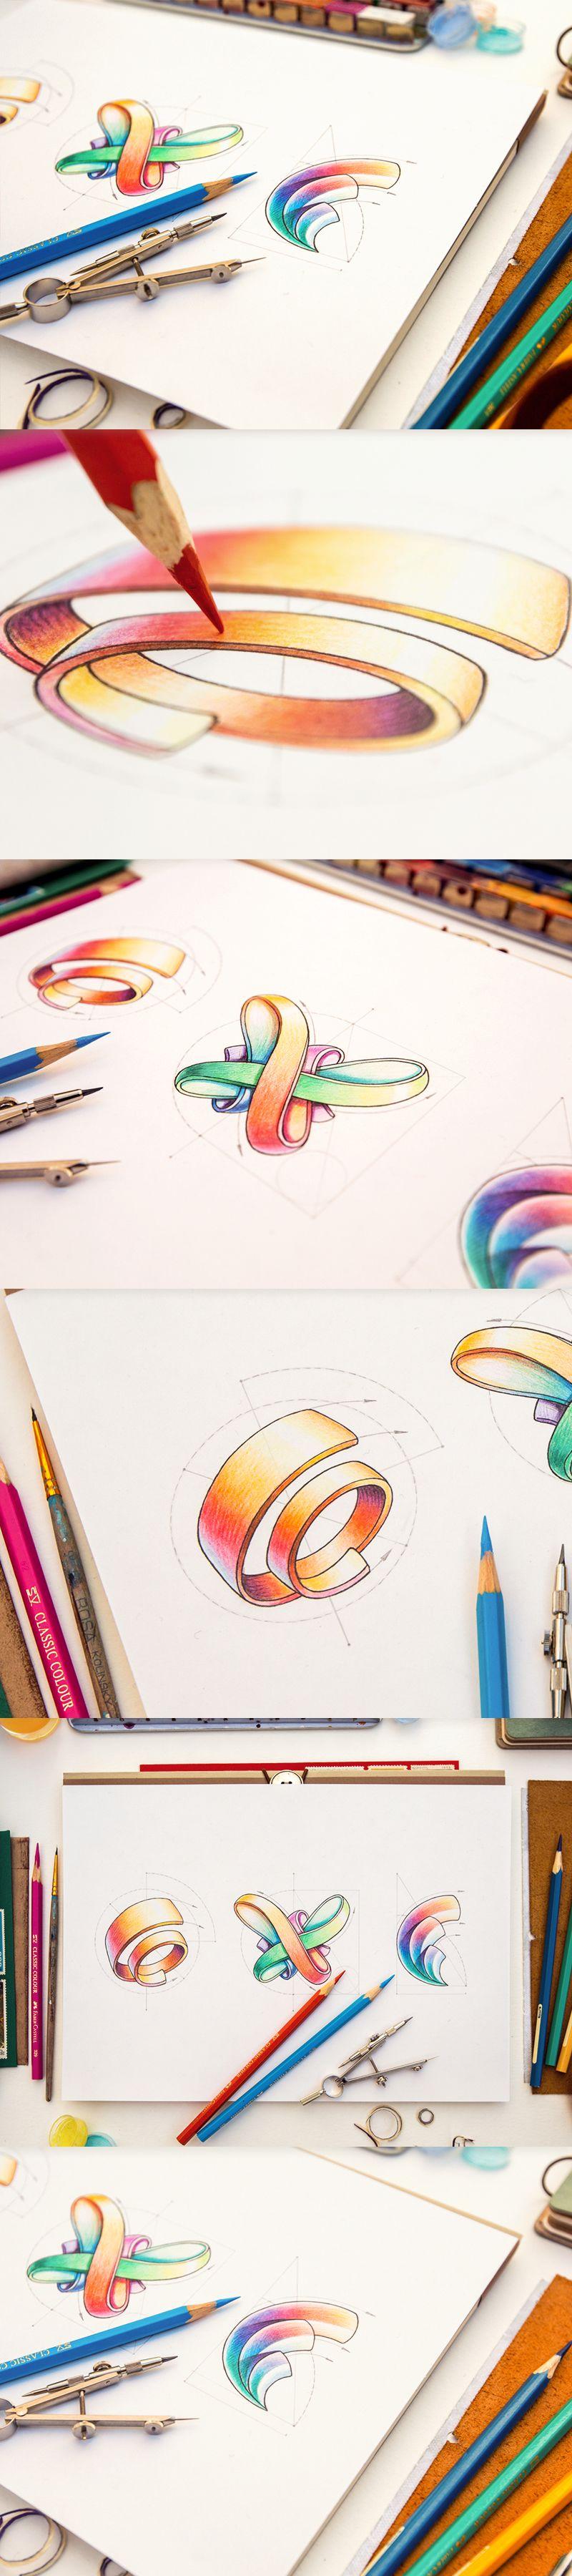 Shading and coloring drawing pinterest the ribbon coloring